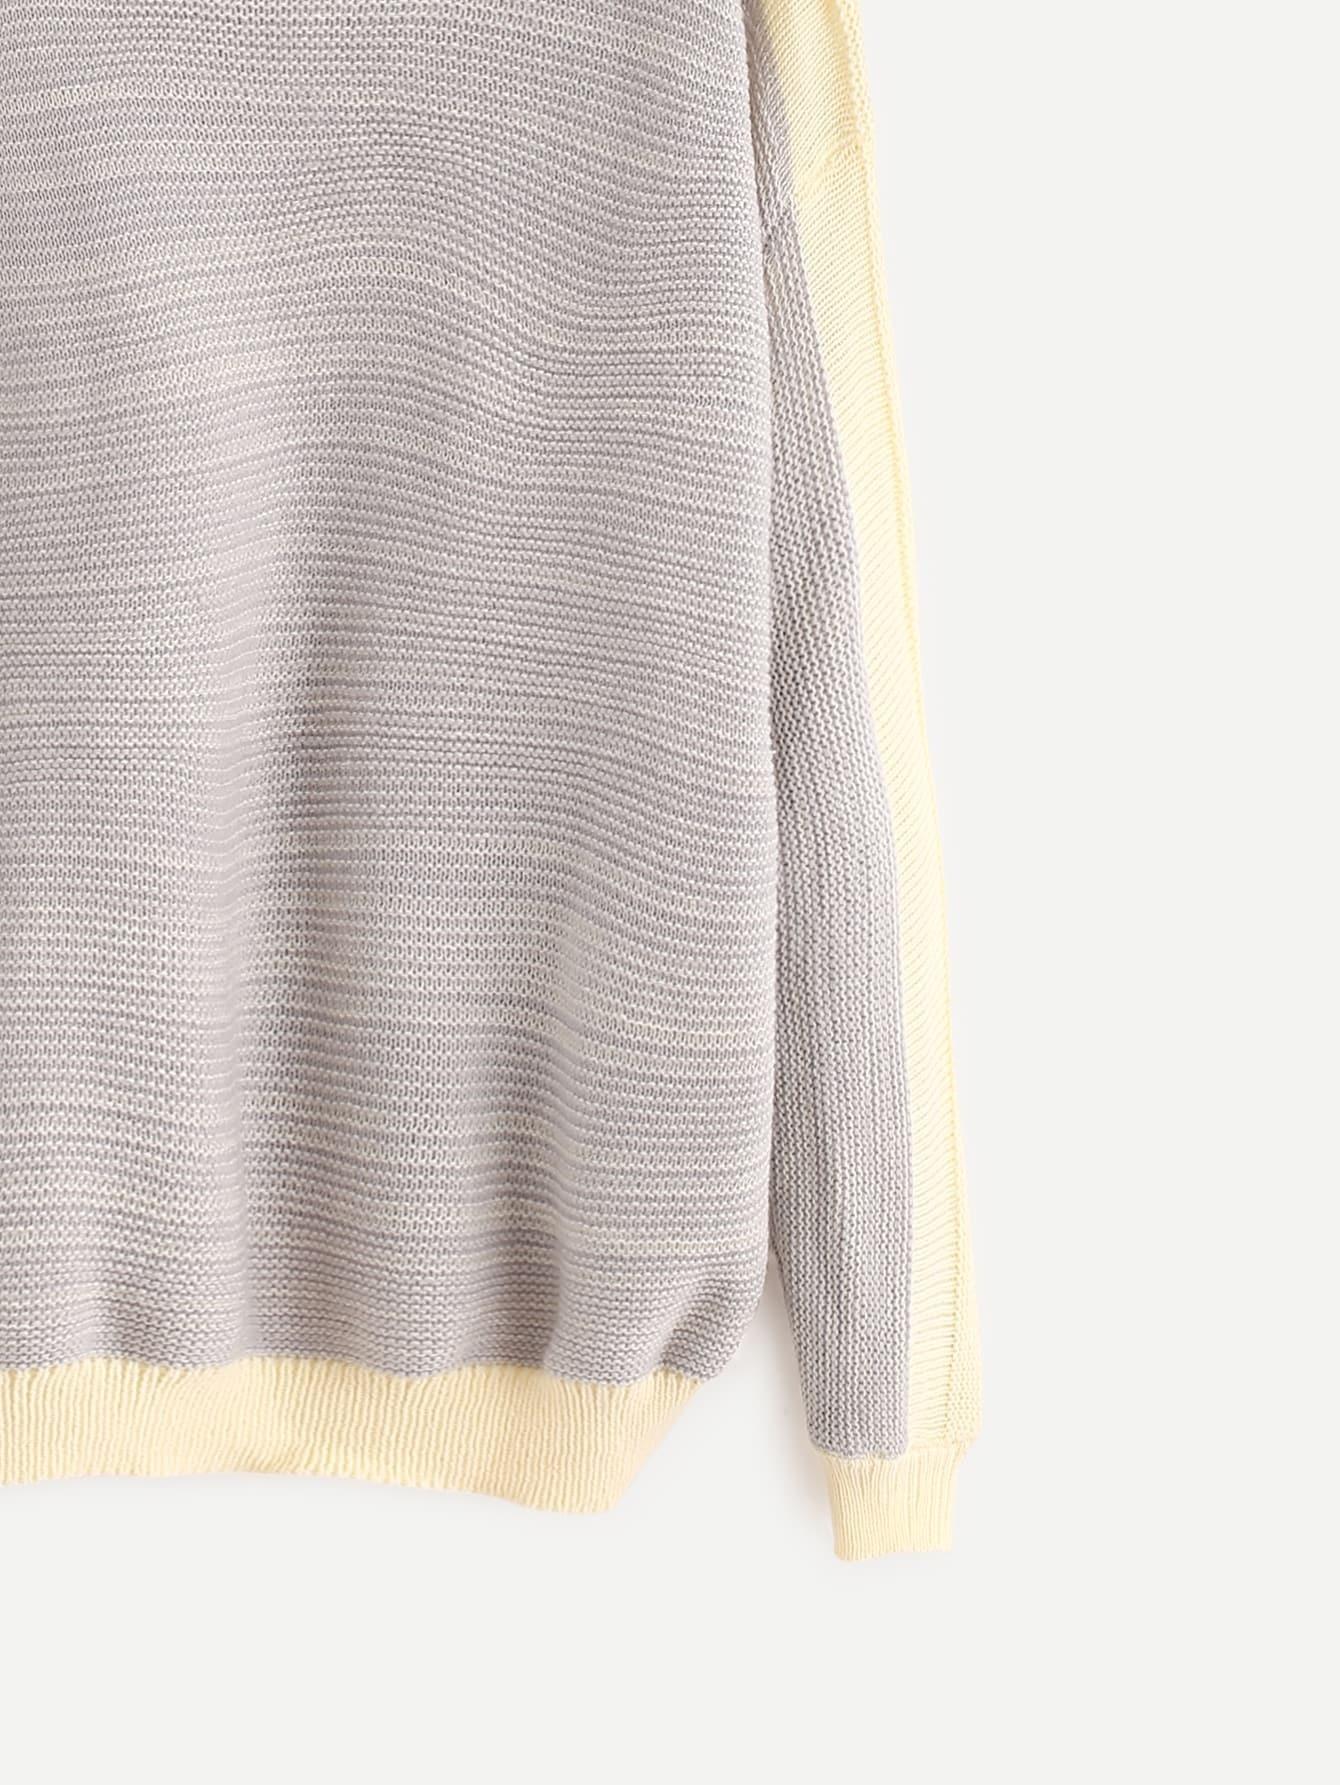 sweater161028006_2